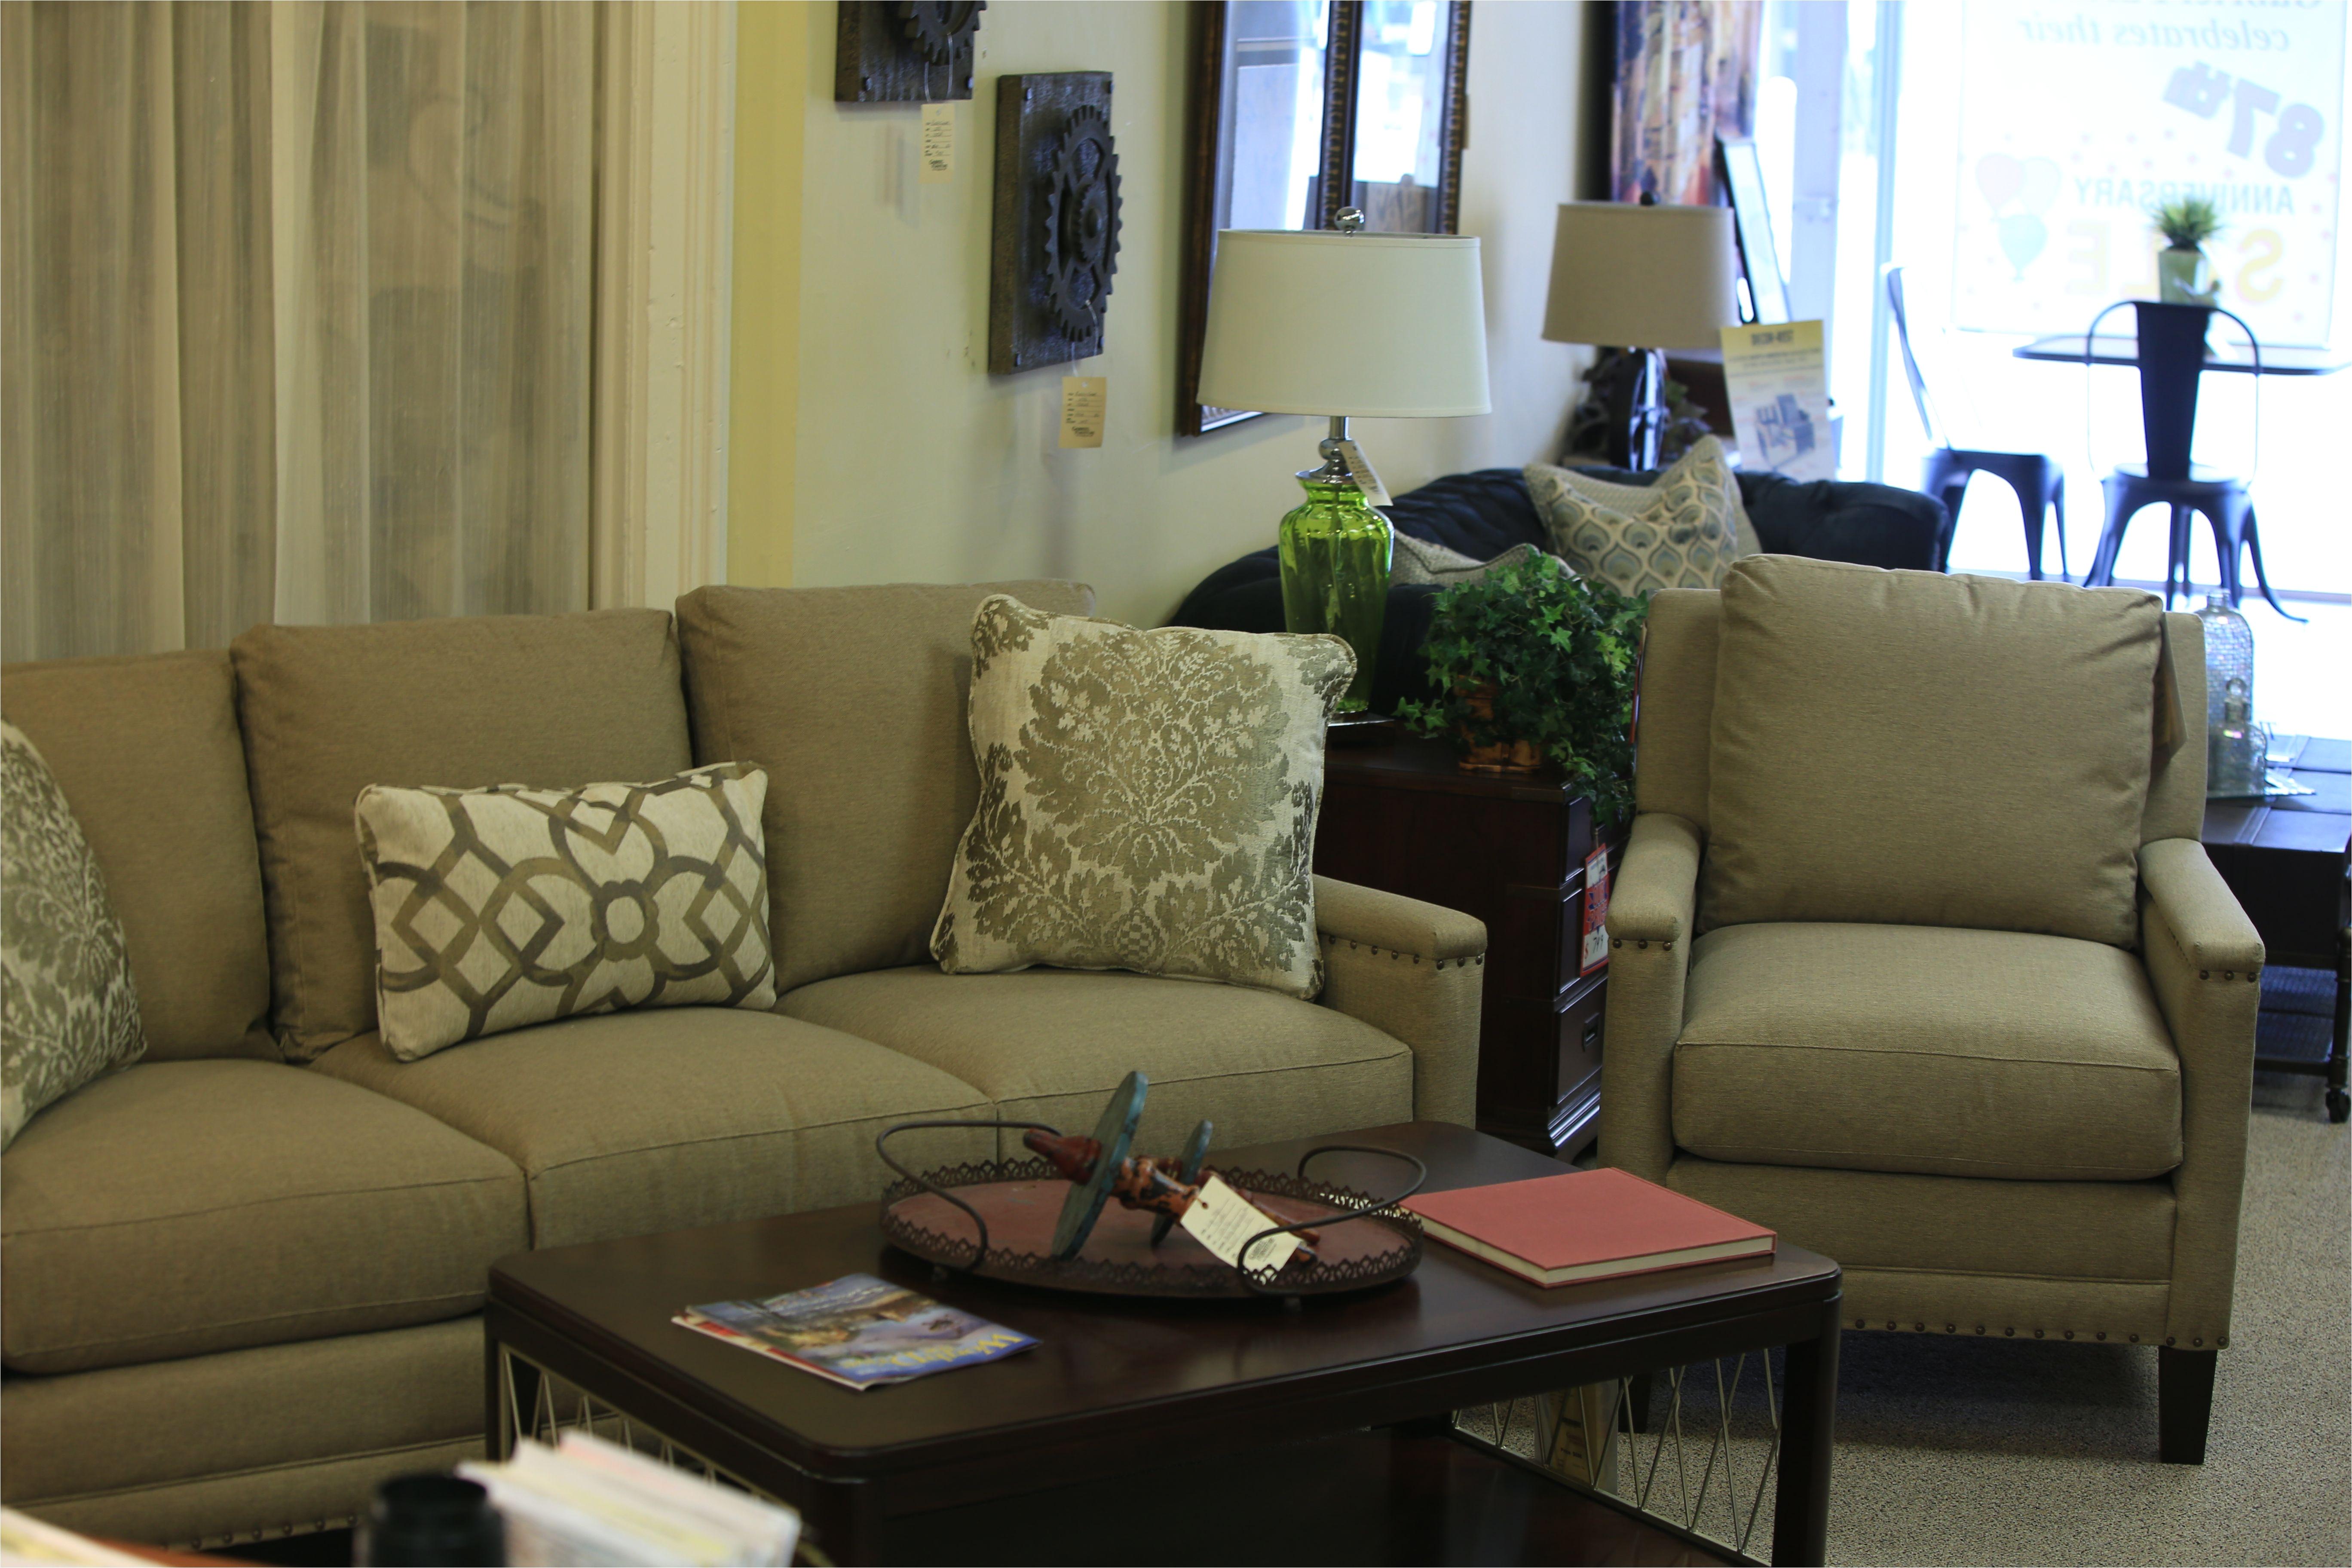 furniture gabriels gabrielfurniture interiordesign foxcities appleton sofa chair